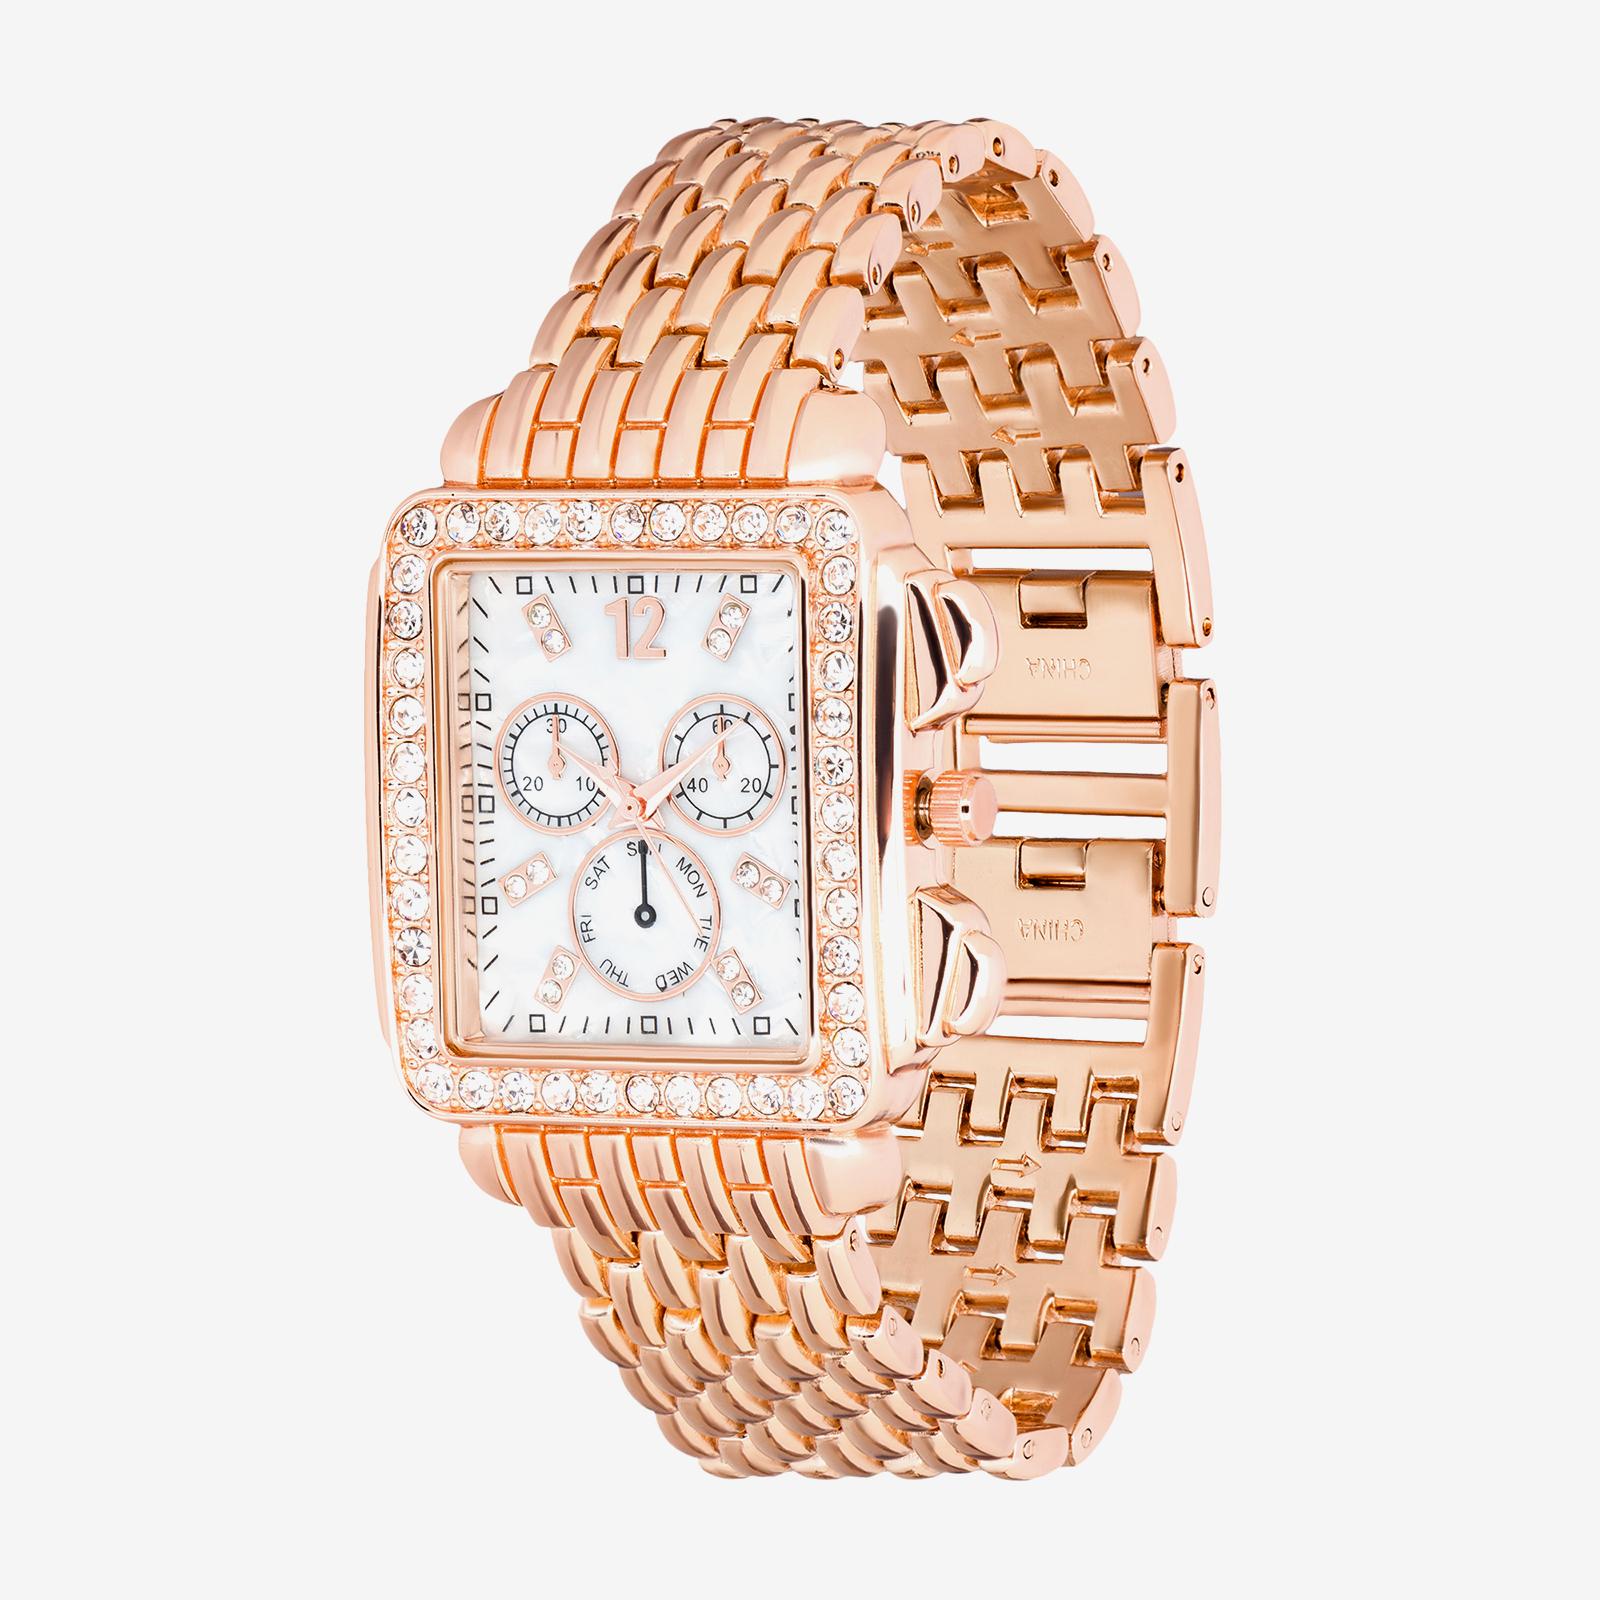 Diamond watch product photography